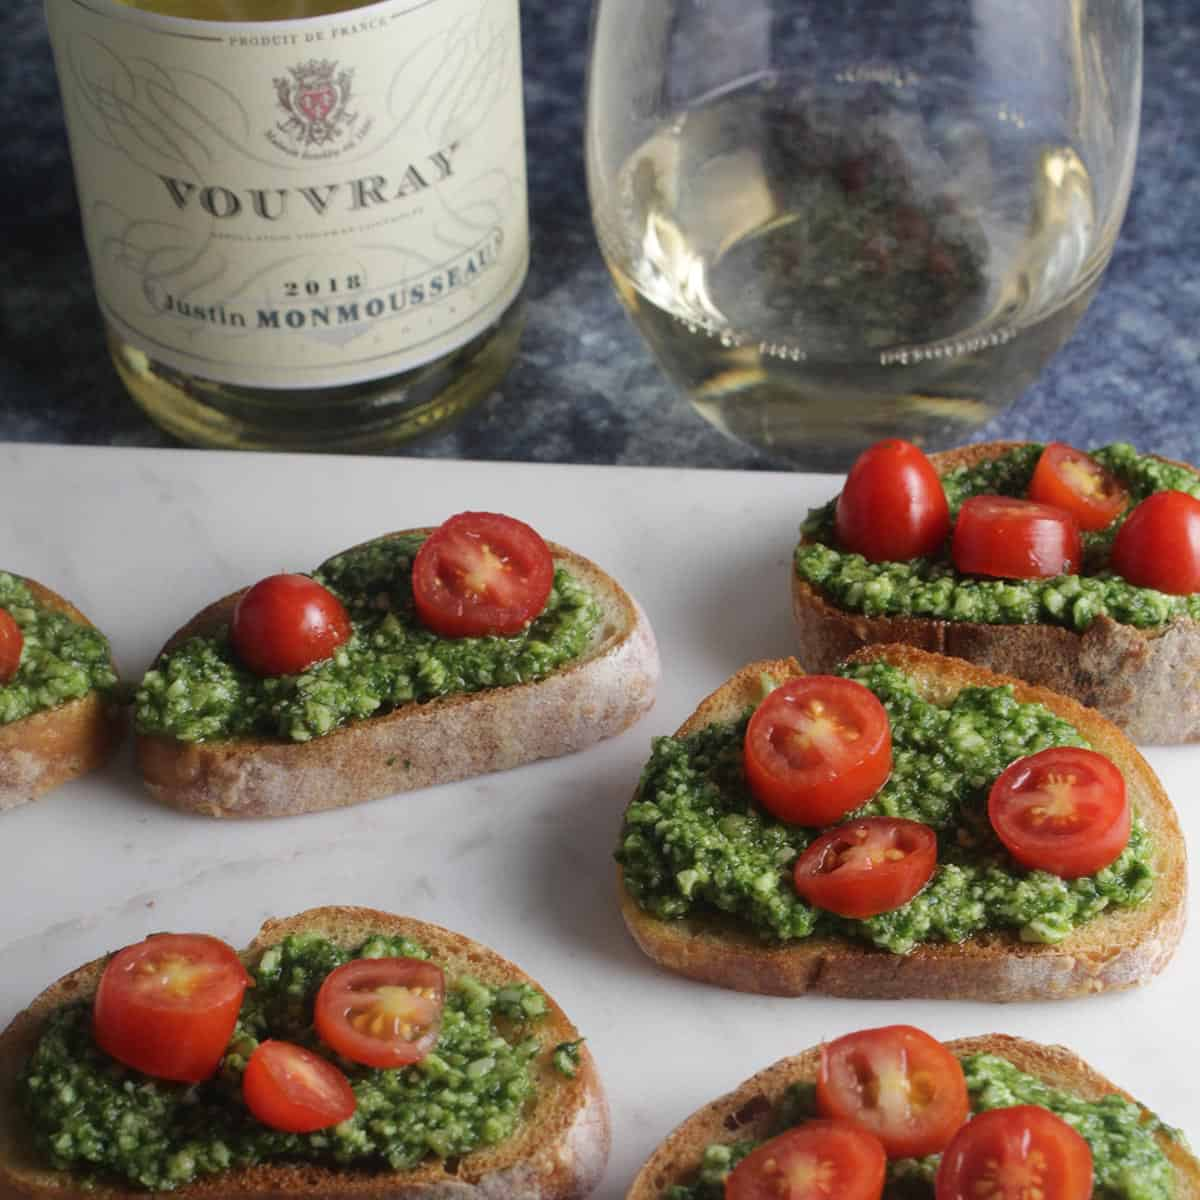 crostini with wine pairing